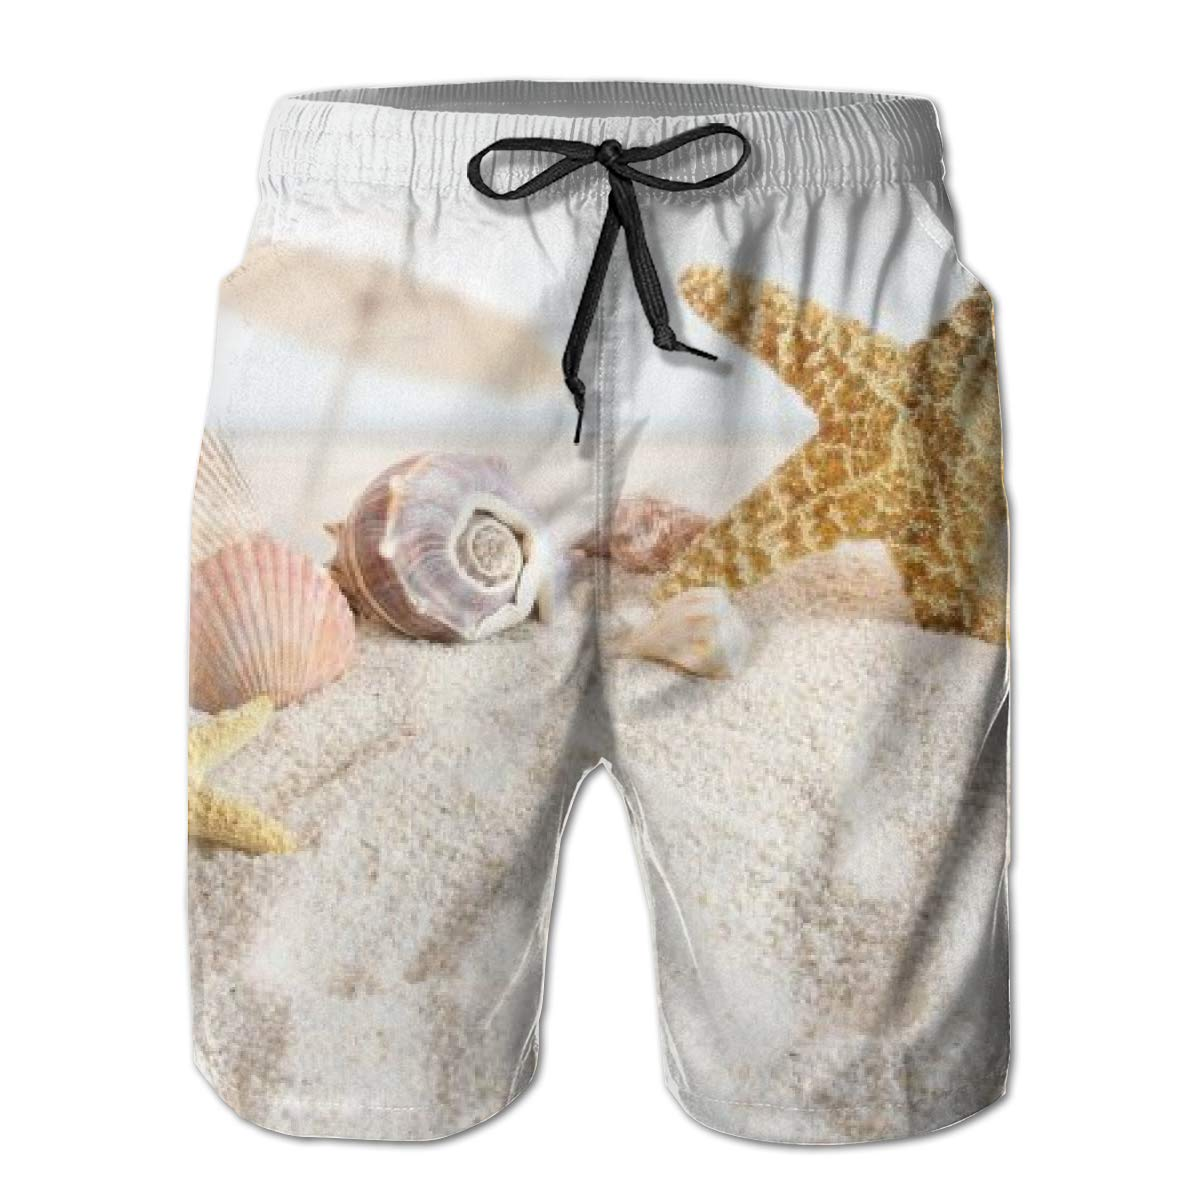 FASUWAVE Mens Swim Trunks Starfish Beach Theme Quick Dry Beach Board Shorts with Mesh Lining